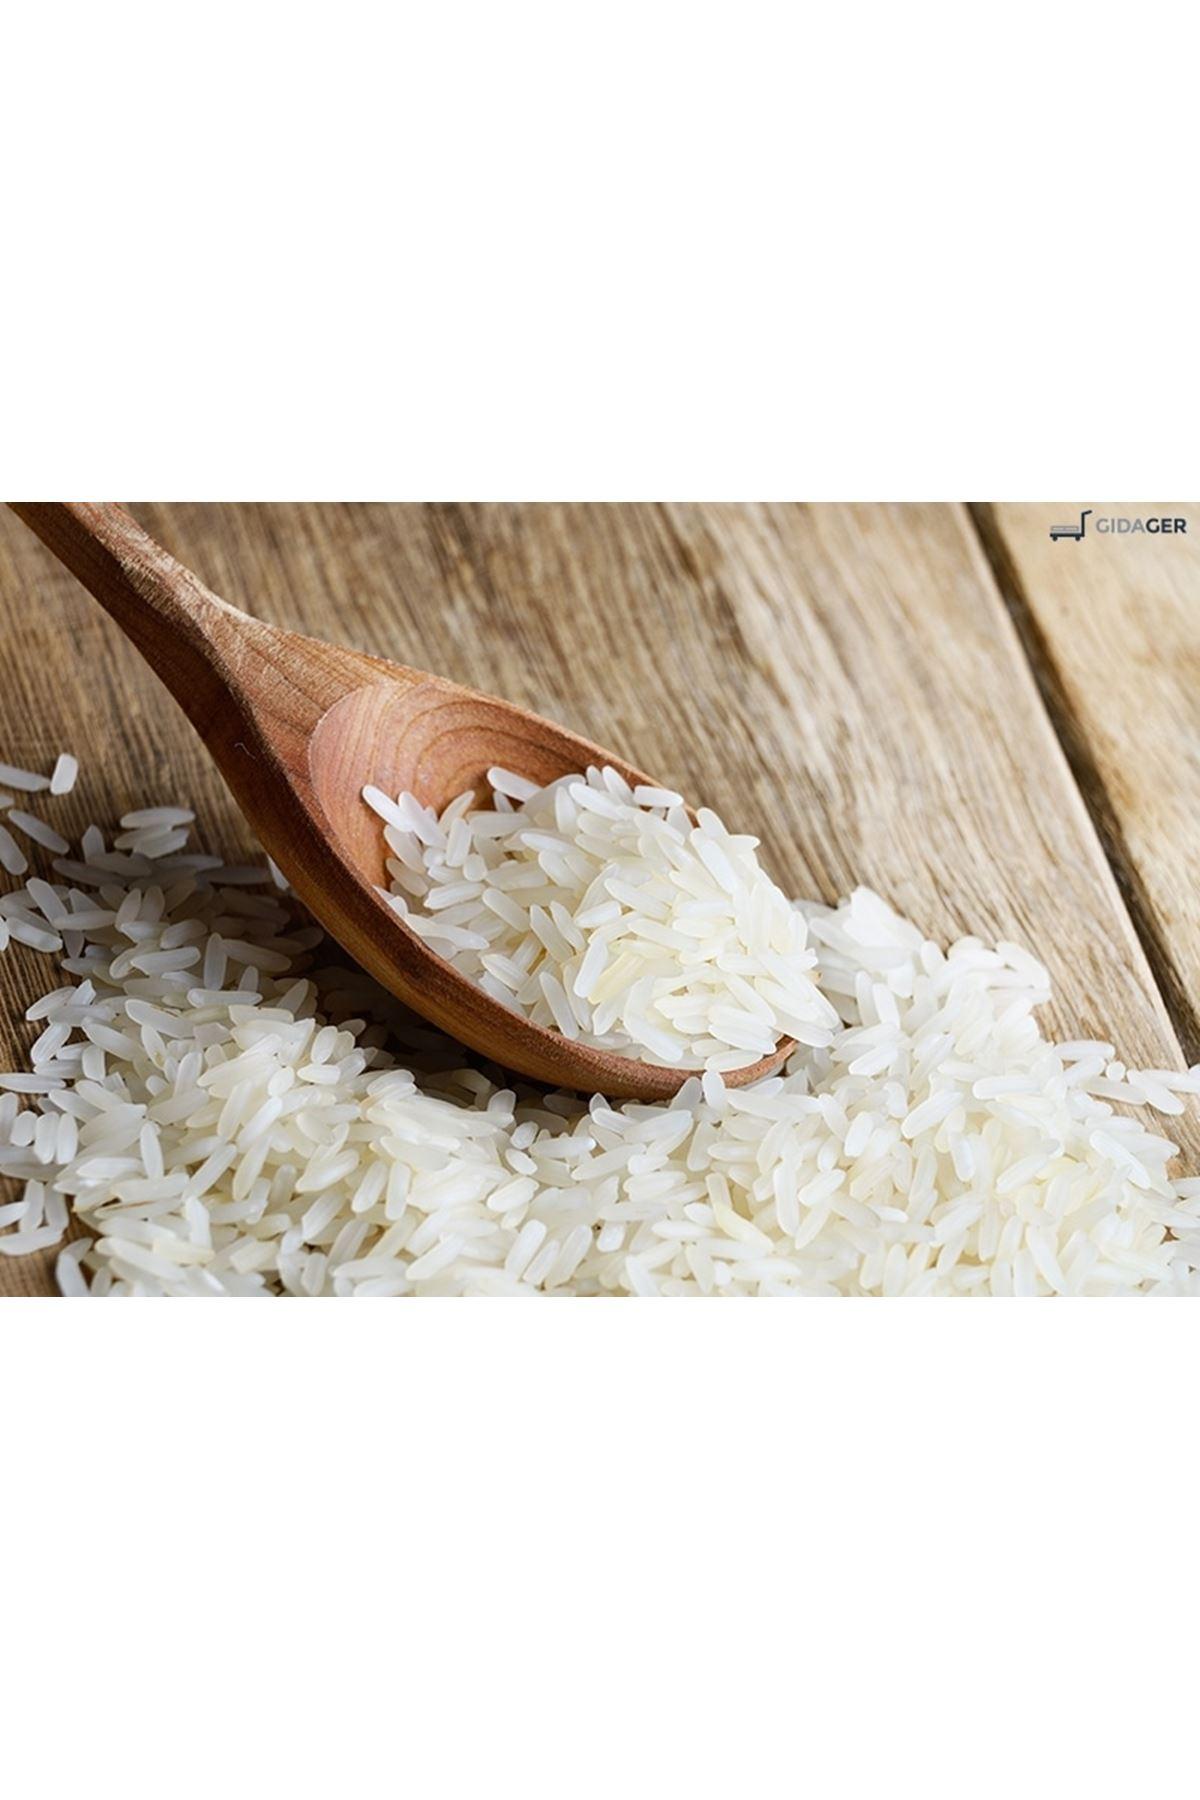 Osmancık Baldo Pirinç - 1 kg